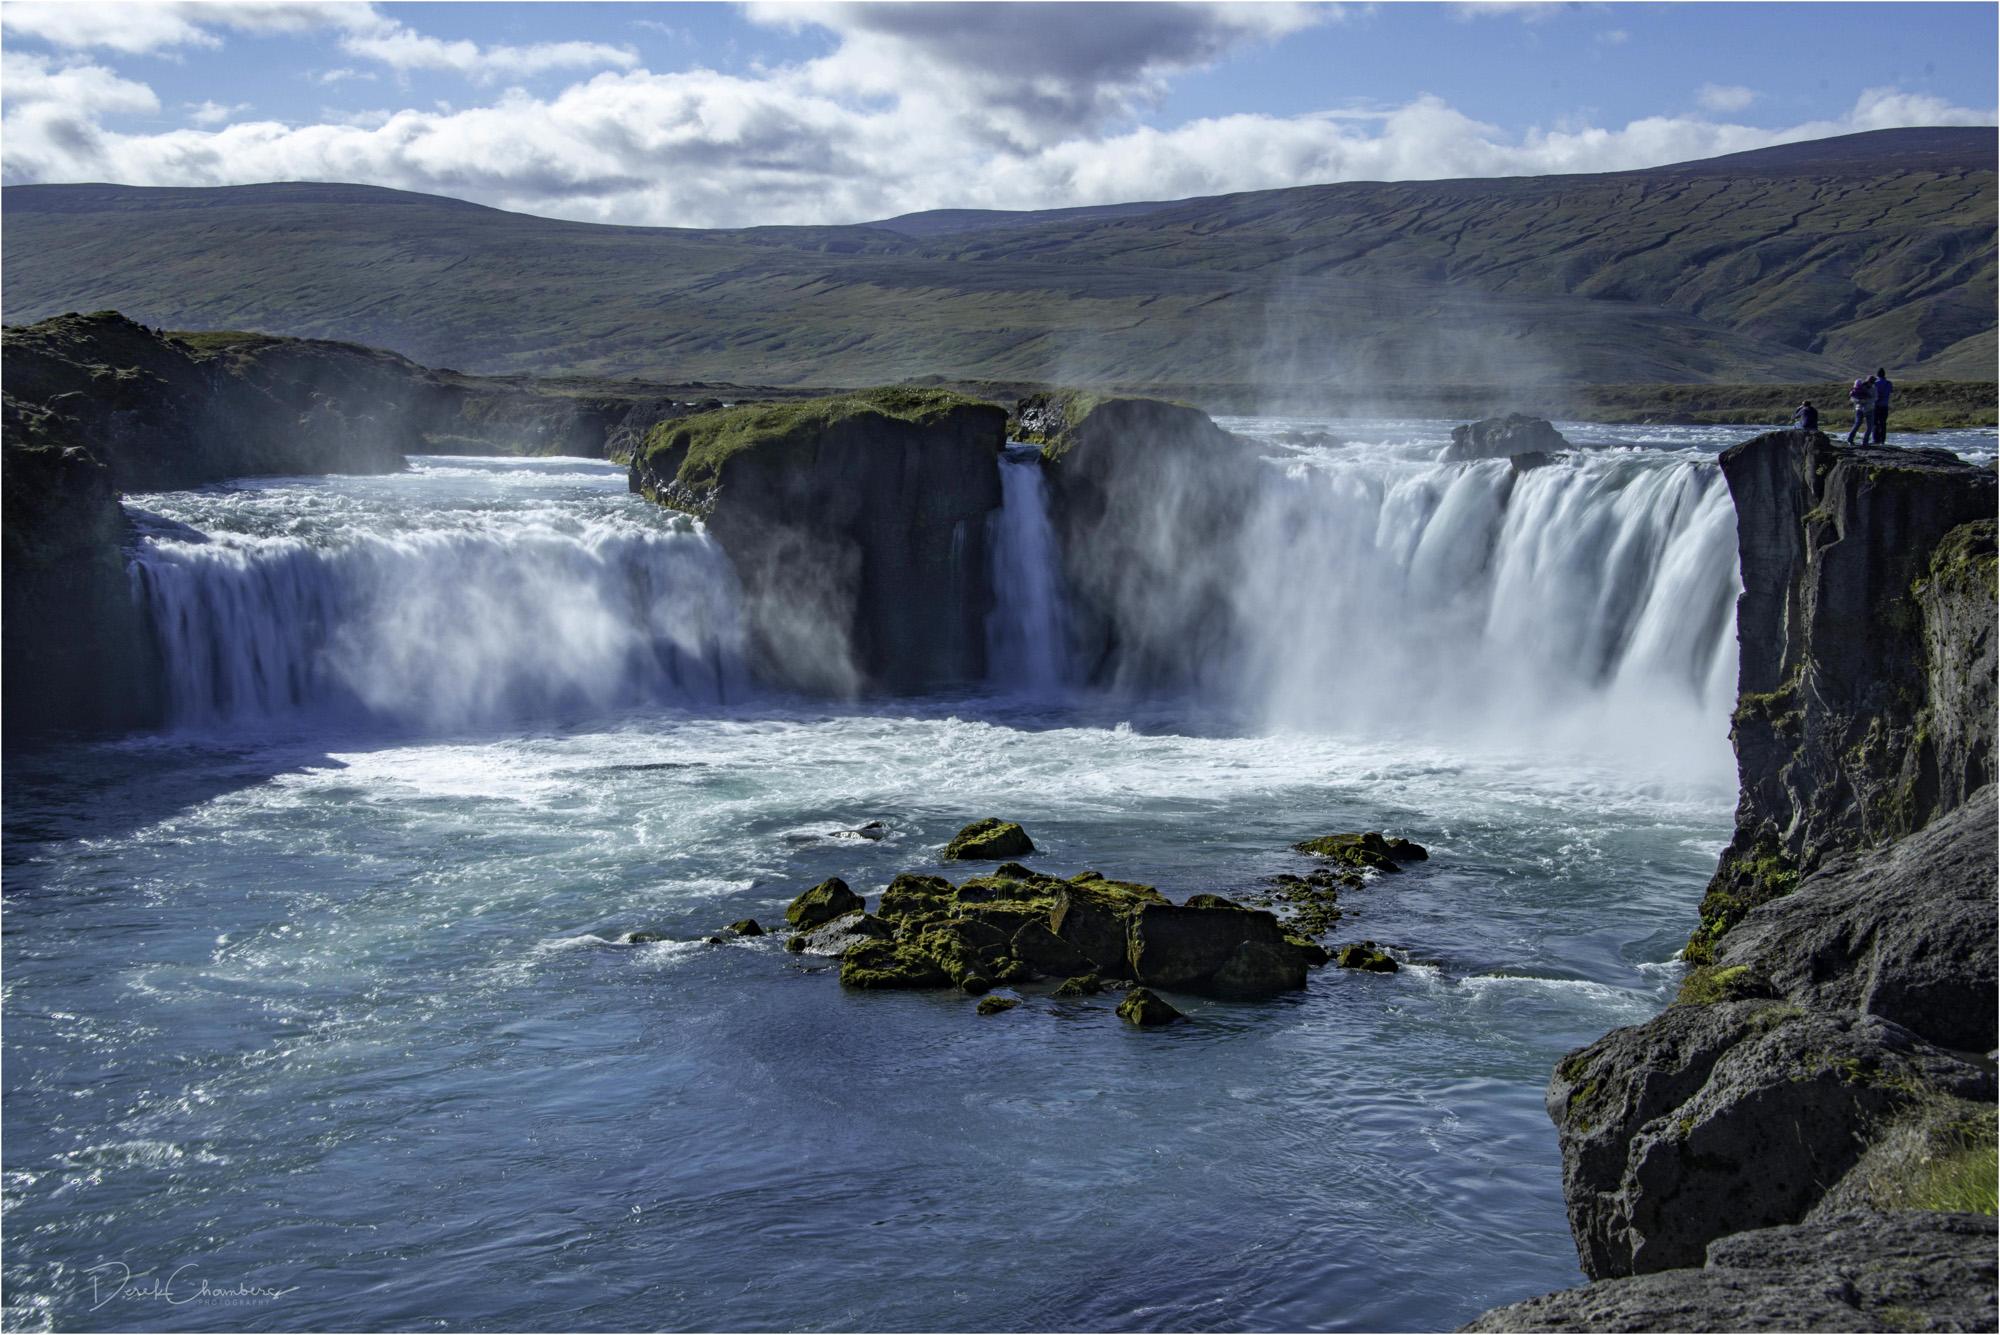 Godafoss, Iceland - Derek Chambers